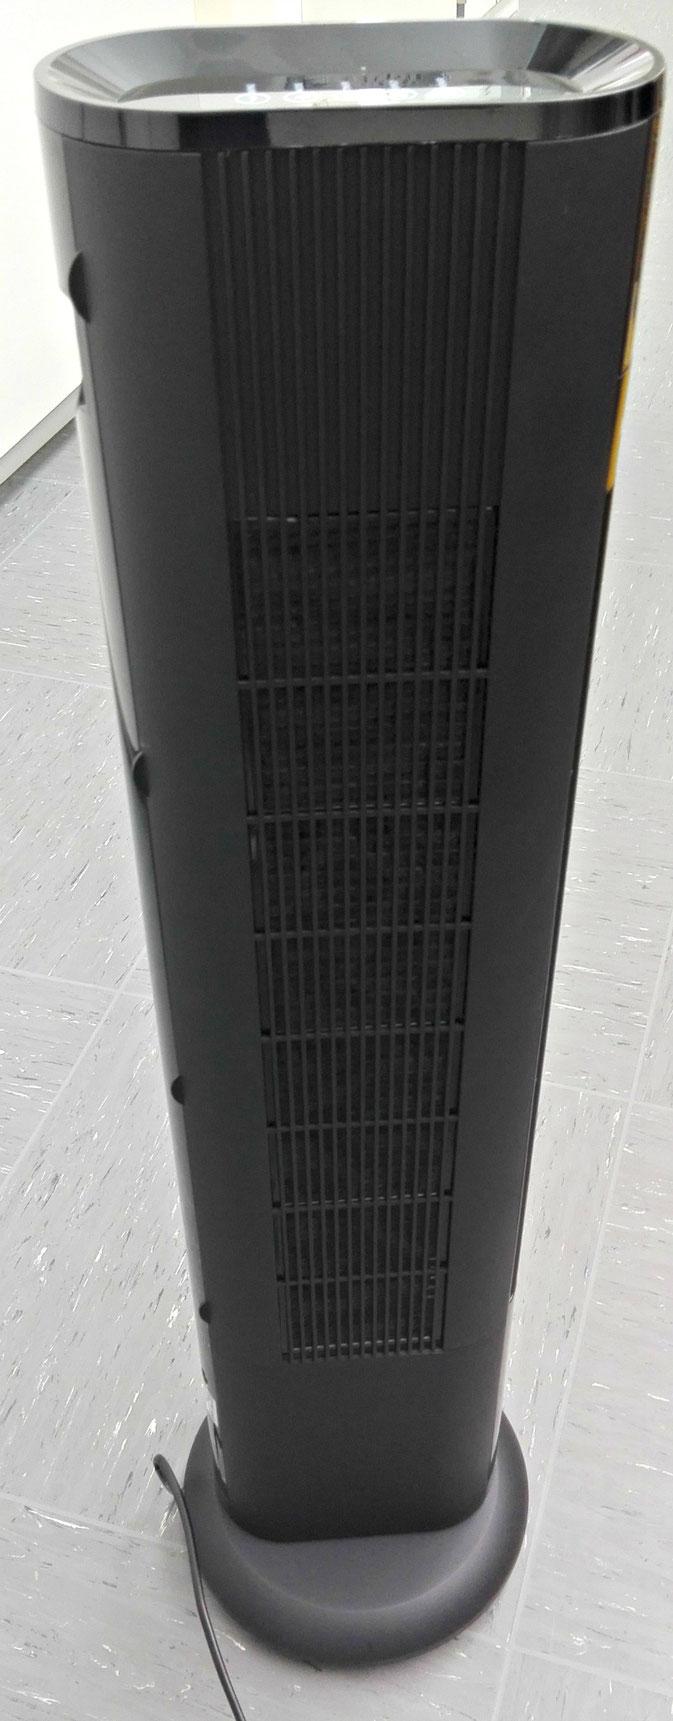 Klarstein Skyscraper Ventilator Test